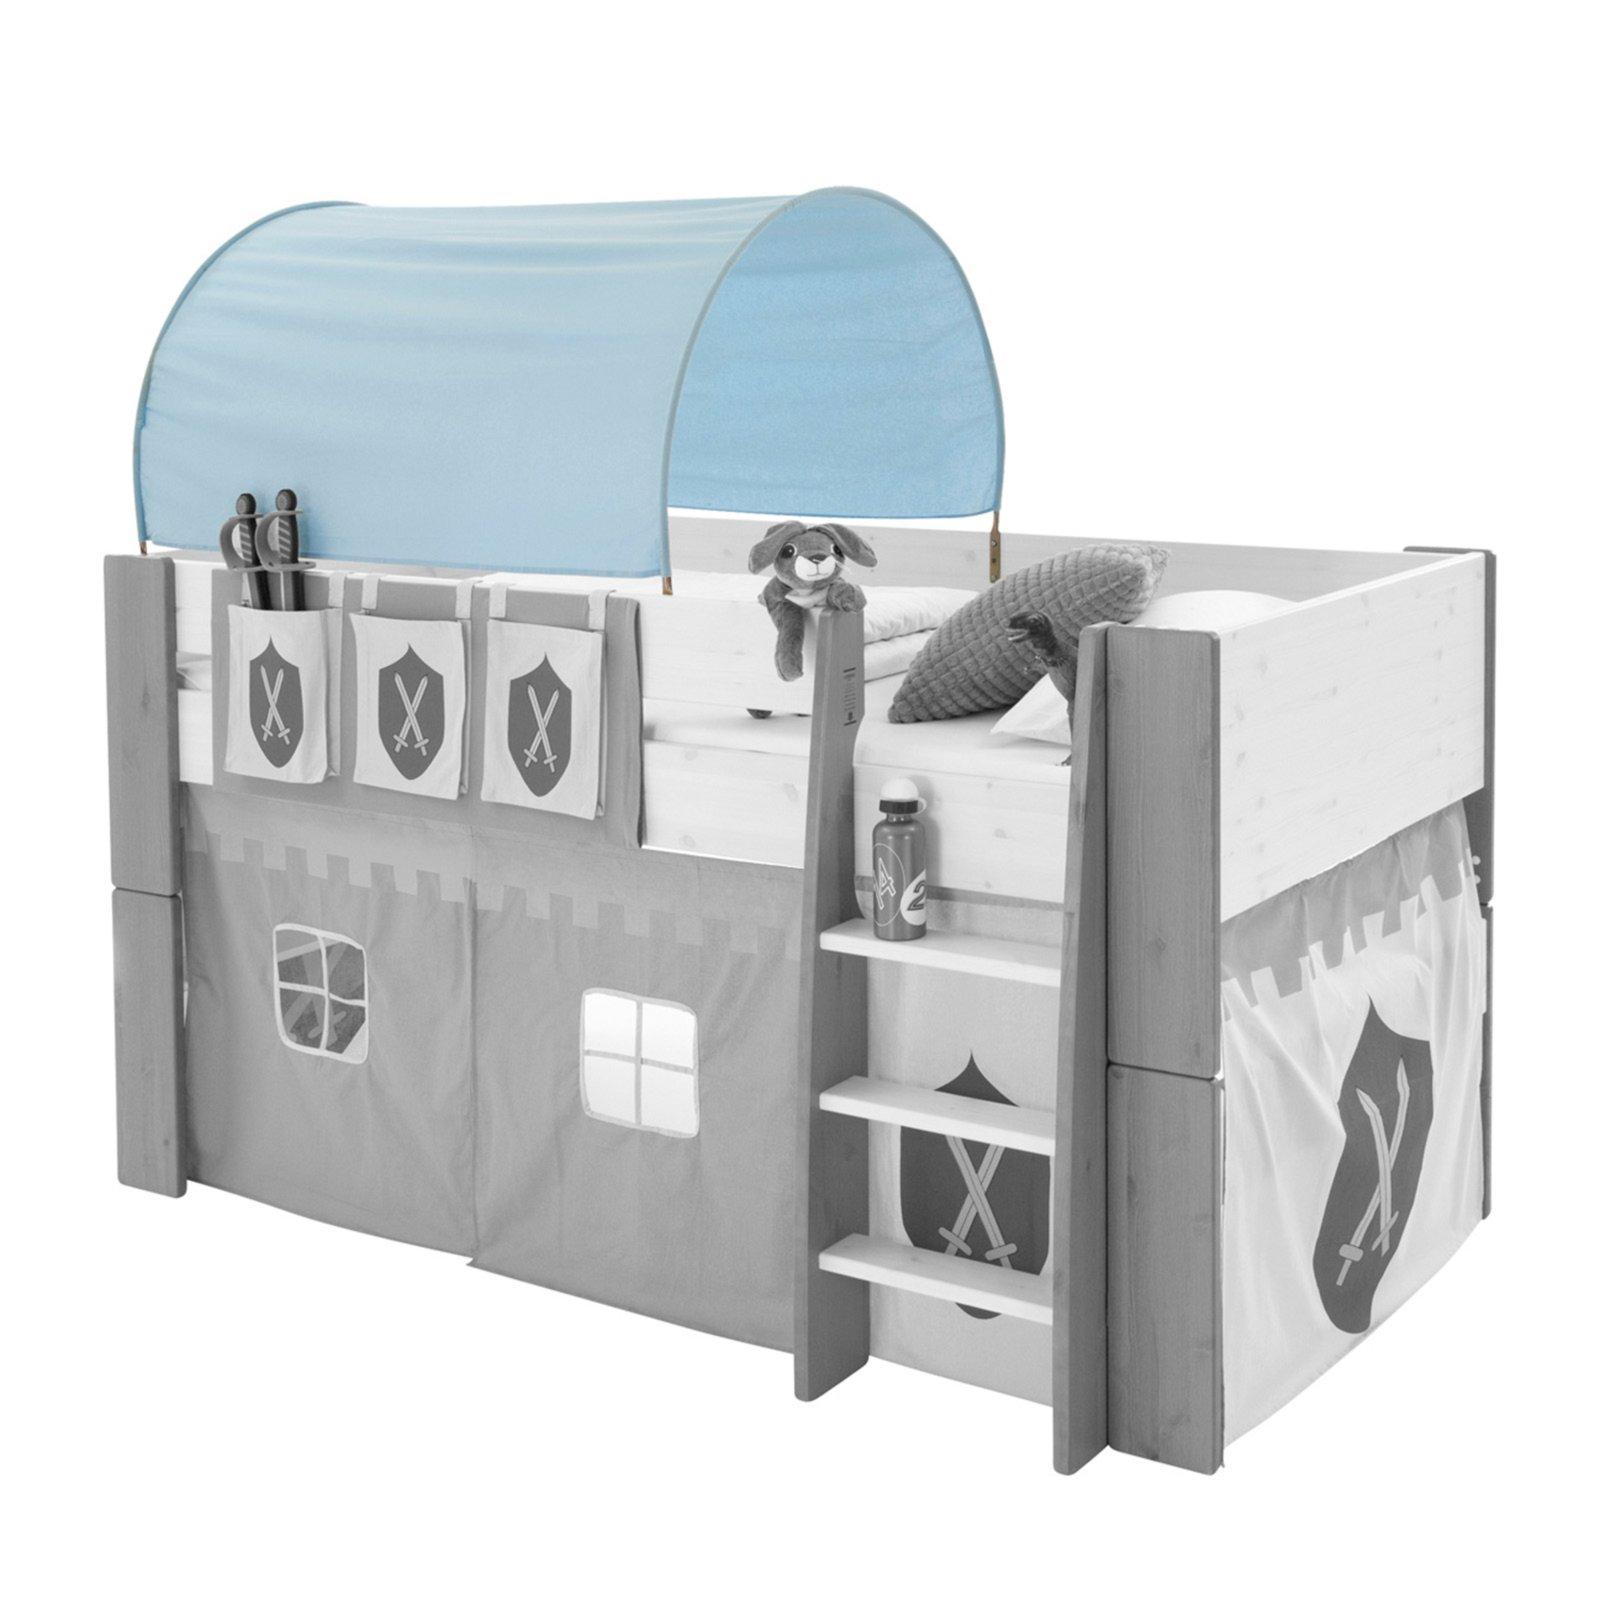 Tunnelzelt kids hellblau 88 cm breit sonstiges for Accessoires kinderzimmer